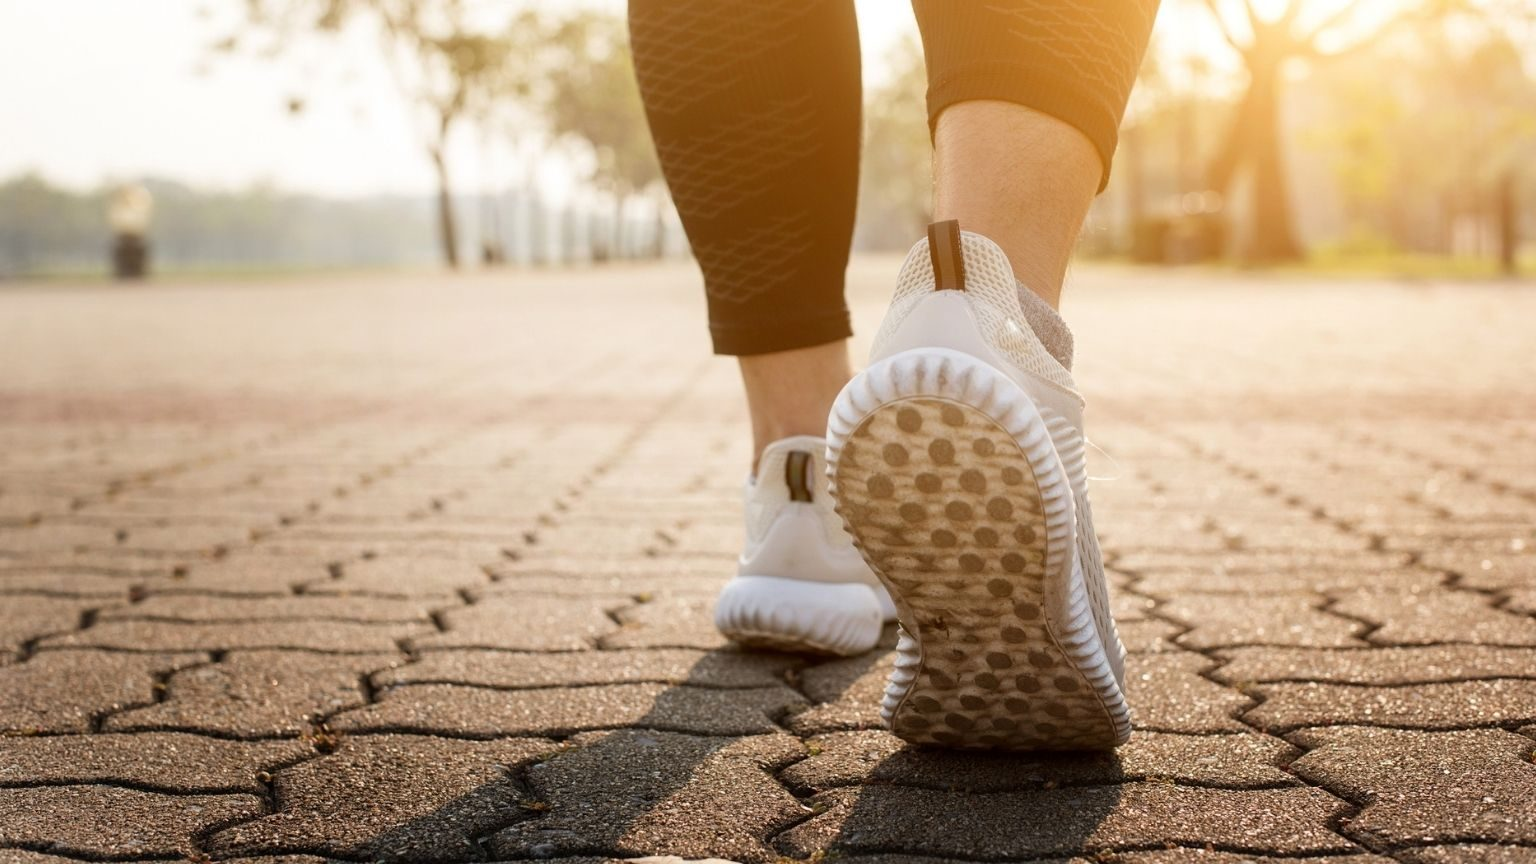 Woman walking on road closeup on shoe